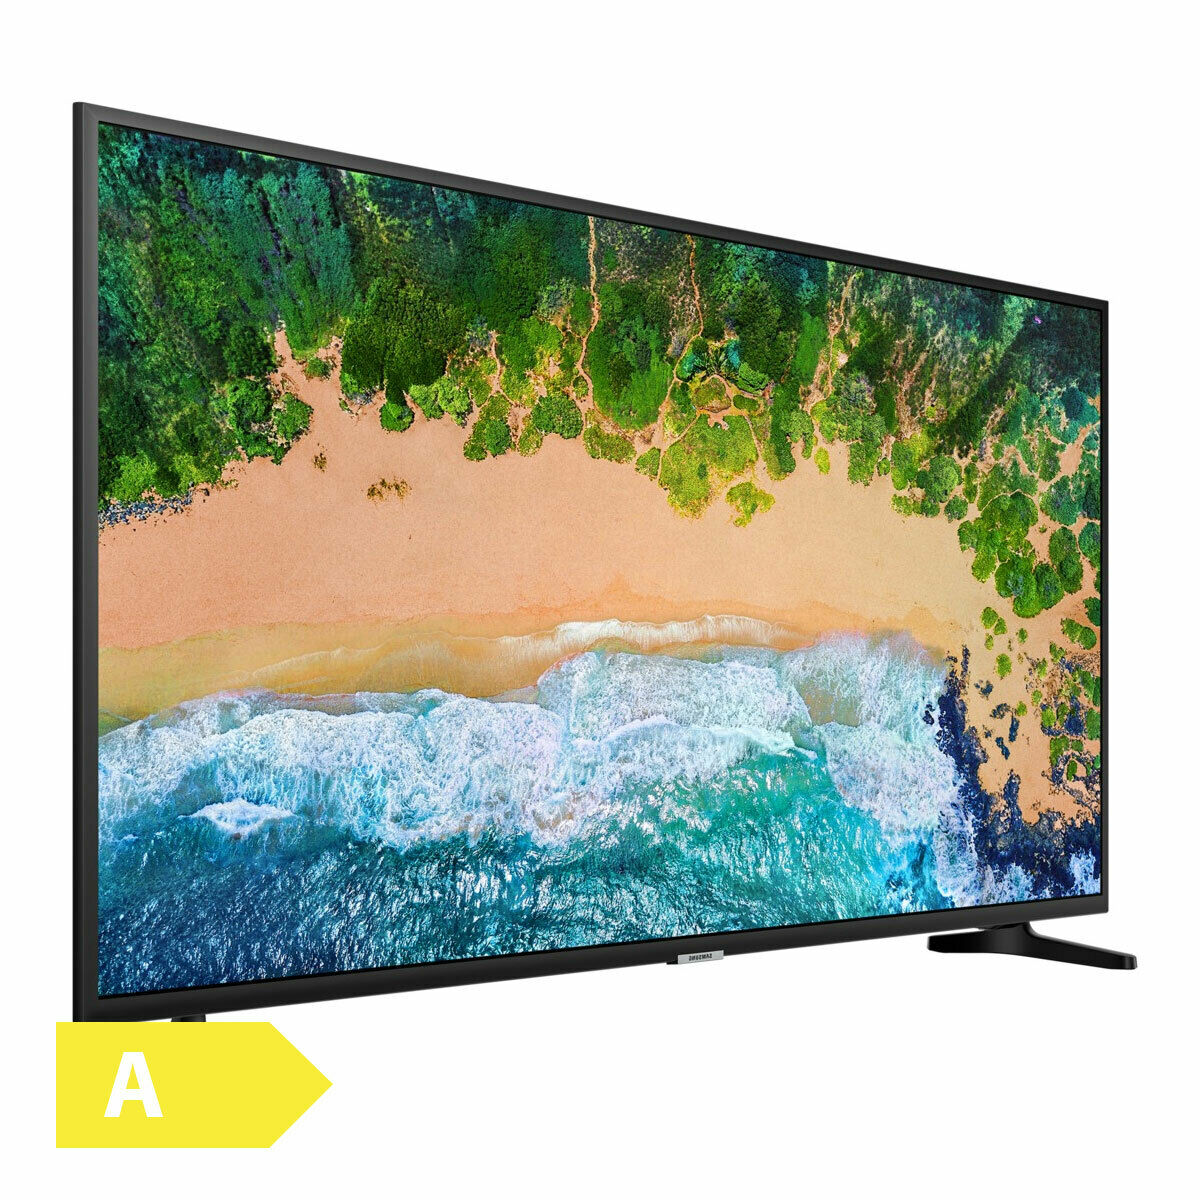 samsung smart tv uhd